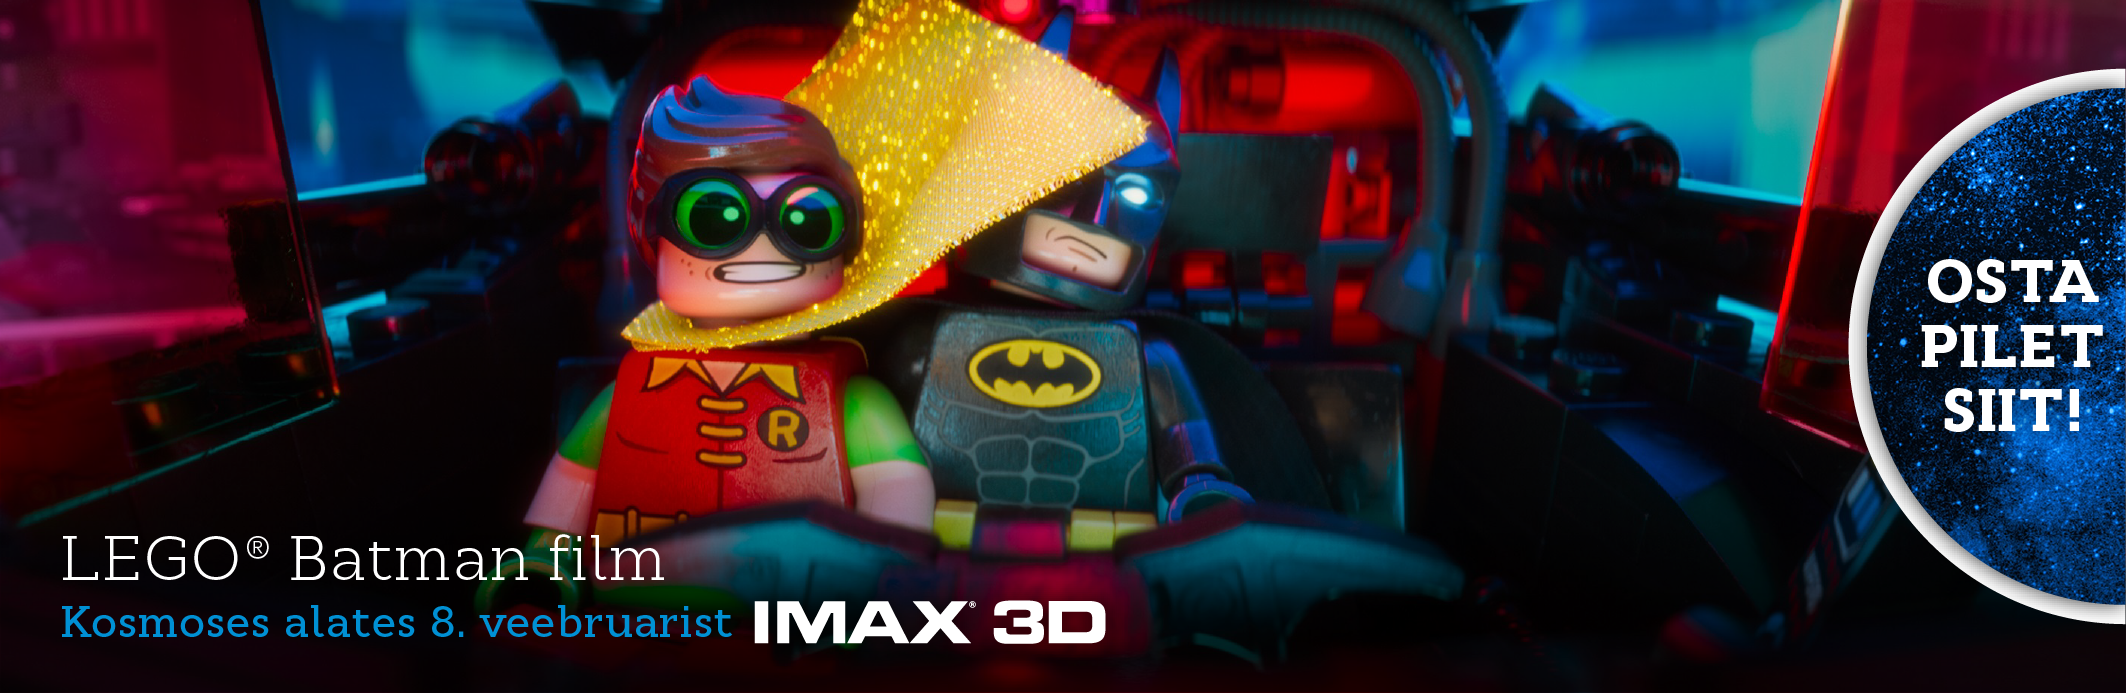 LEGO® Batman film IMAX 3D (bänner)